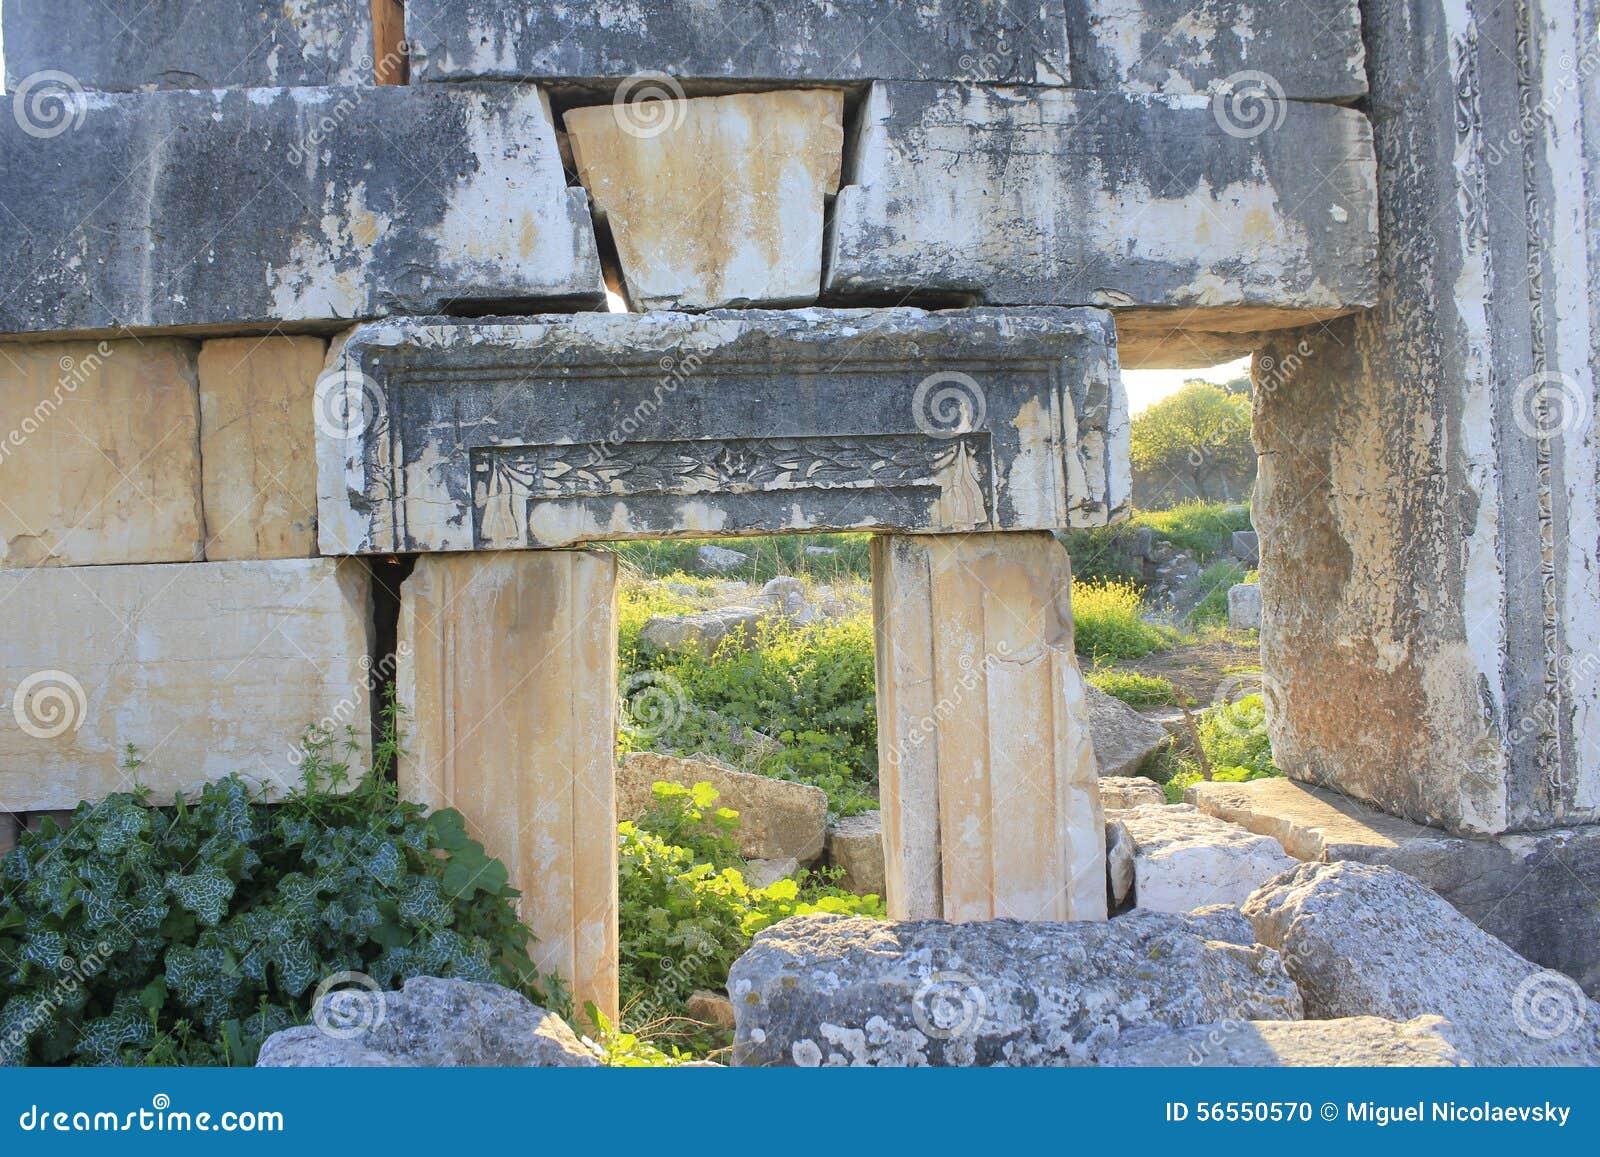 Ruins of Ancient City of Biblical Kedesh in Israel